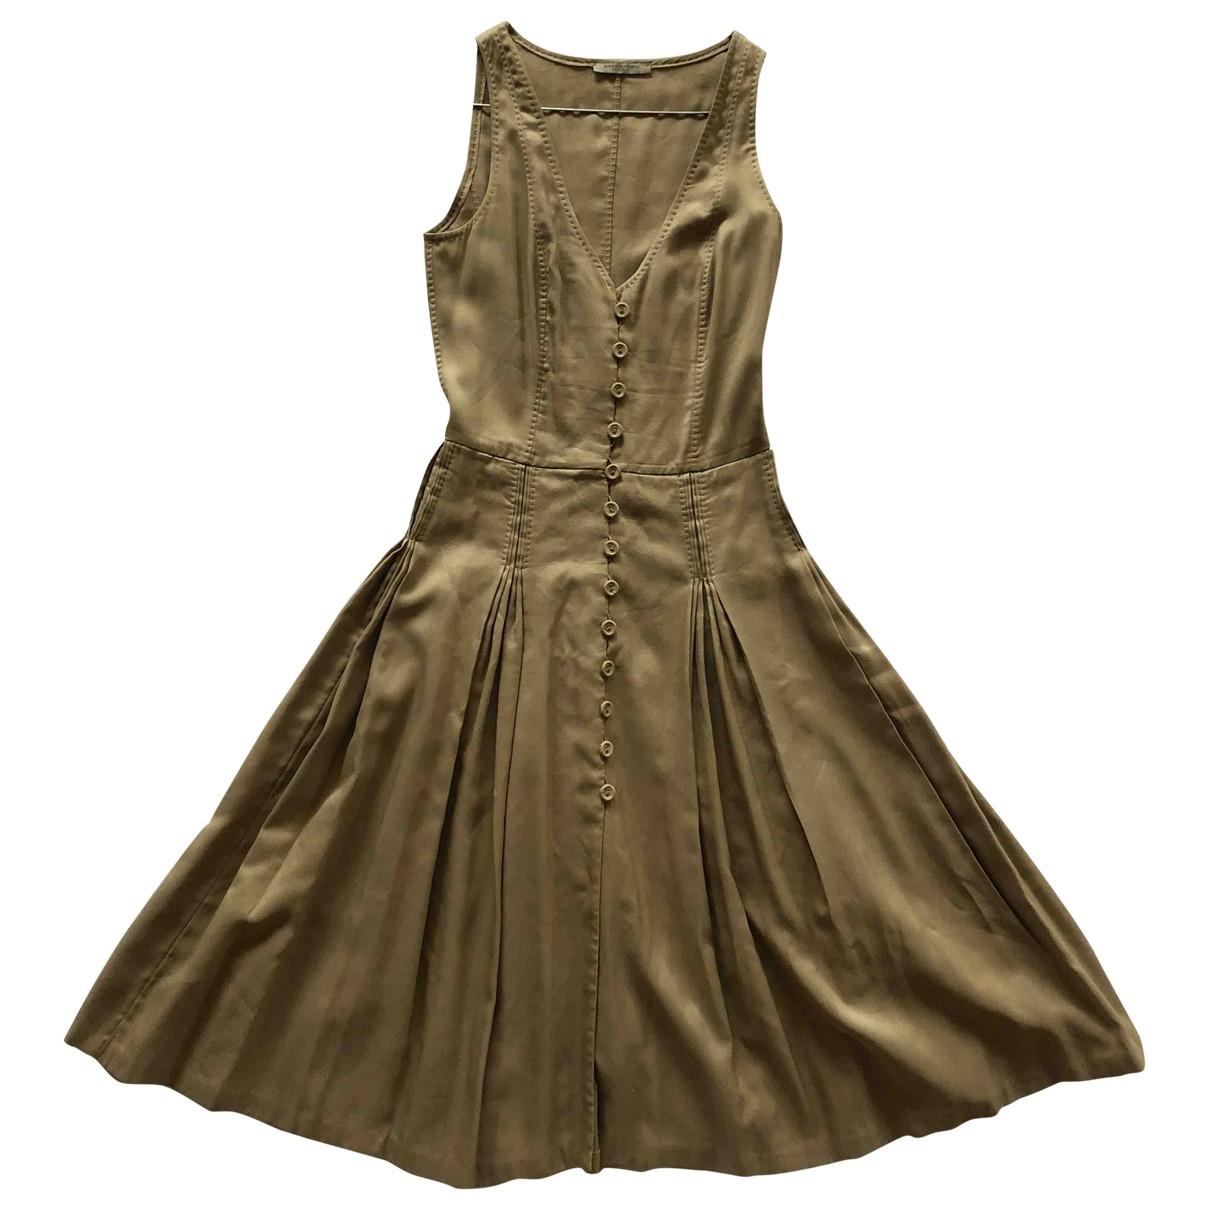 Bottega Veneta \N Khaki Cotton dress for Women 38 IT